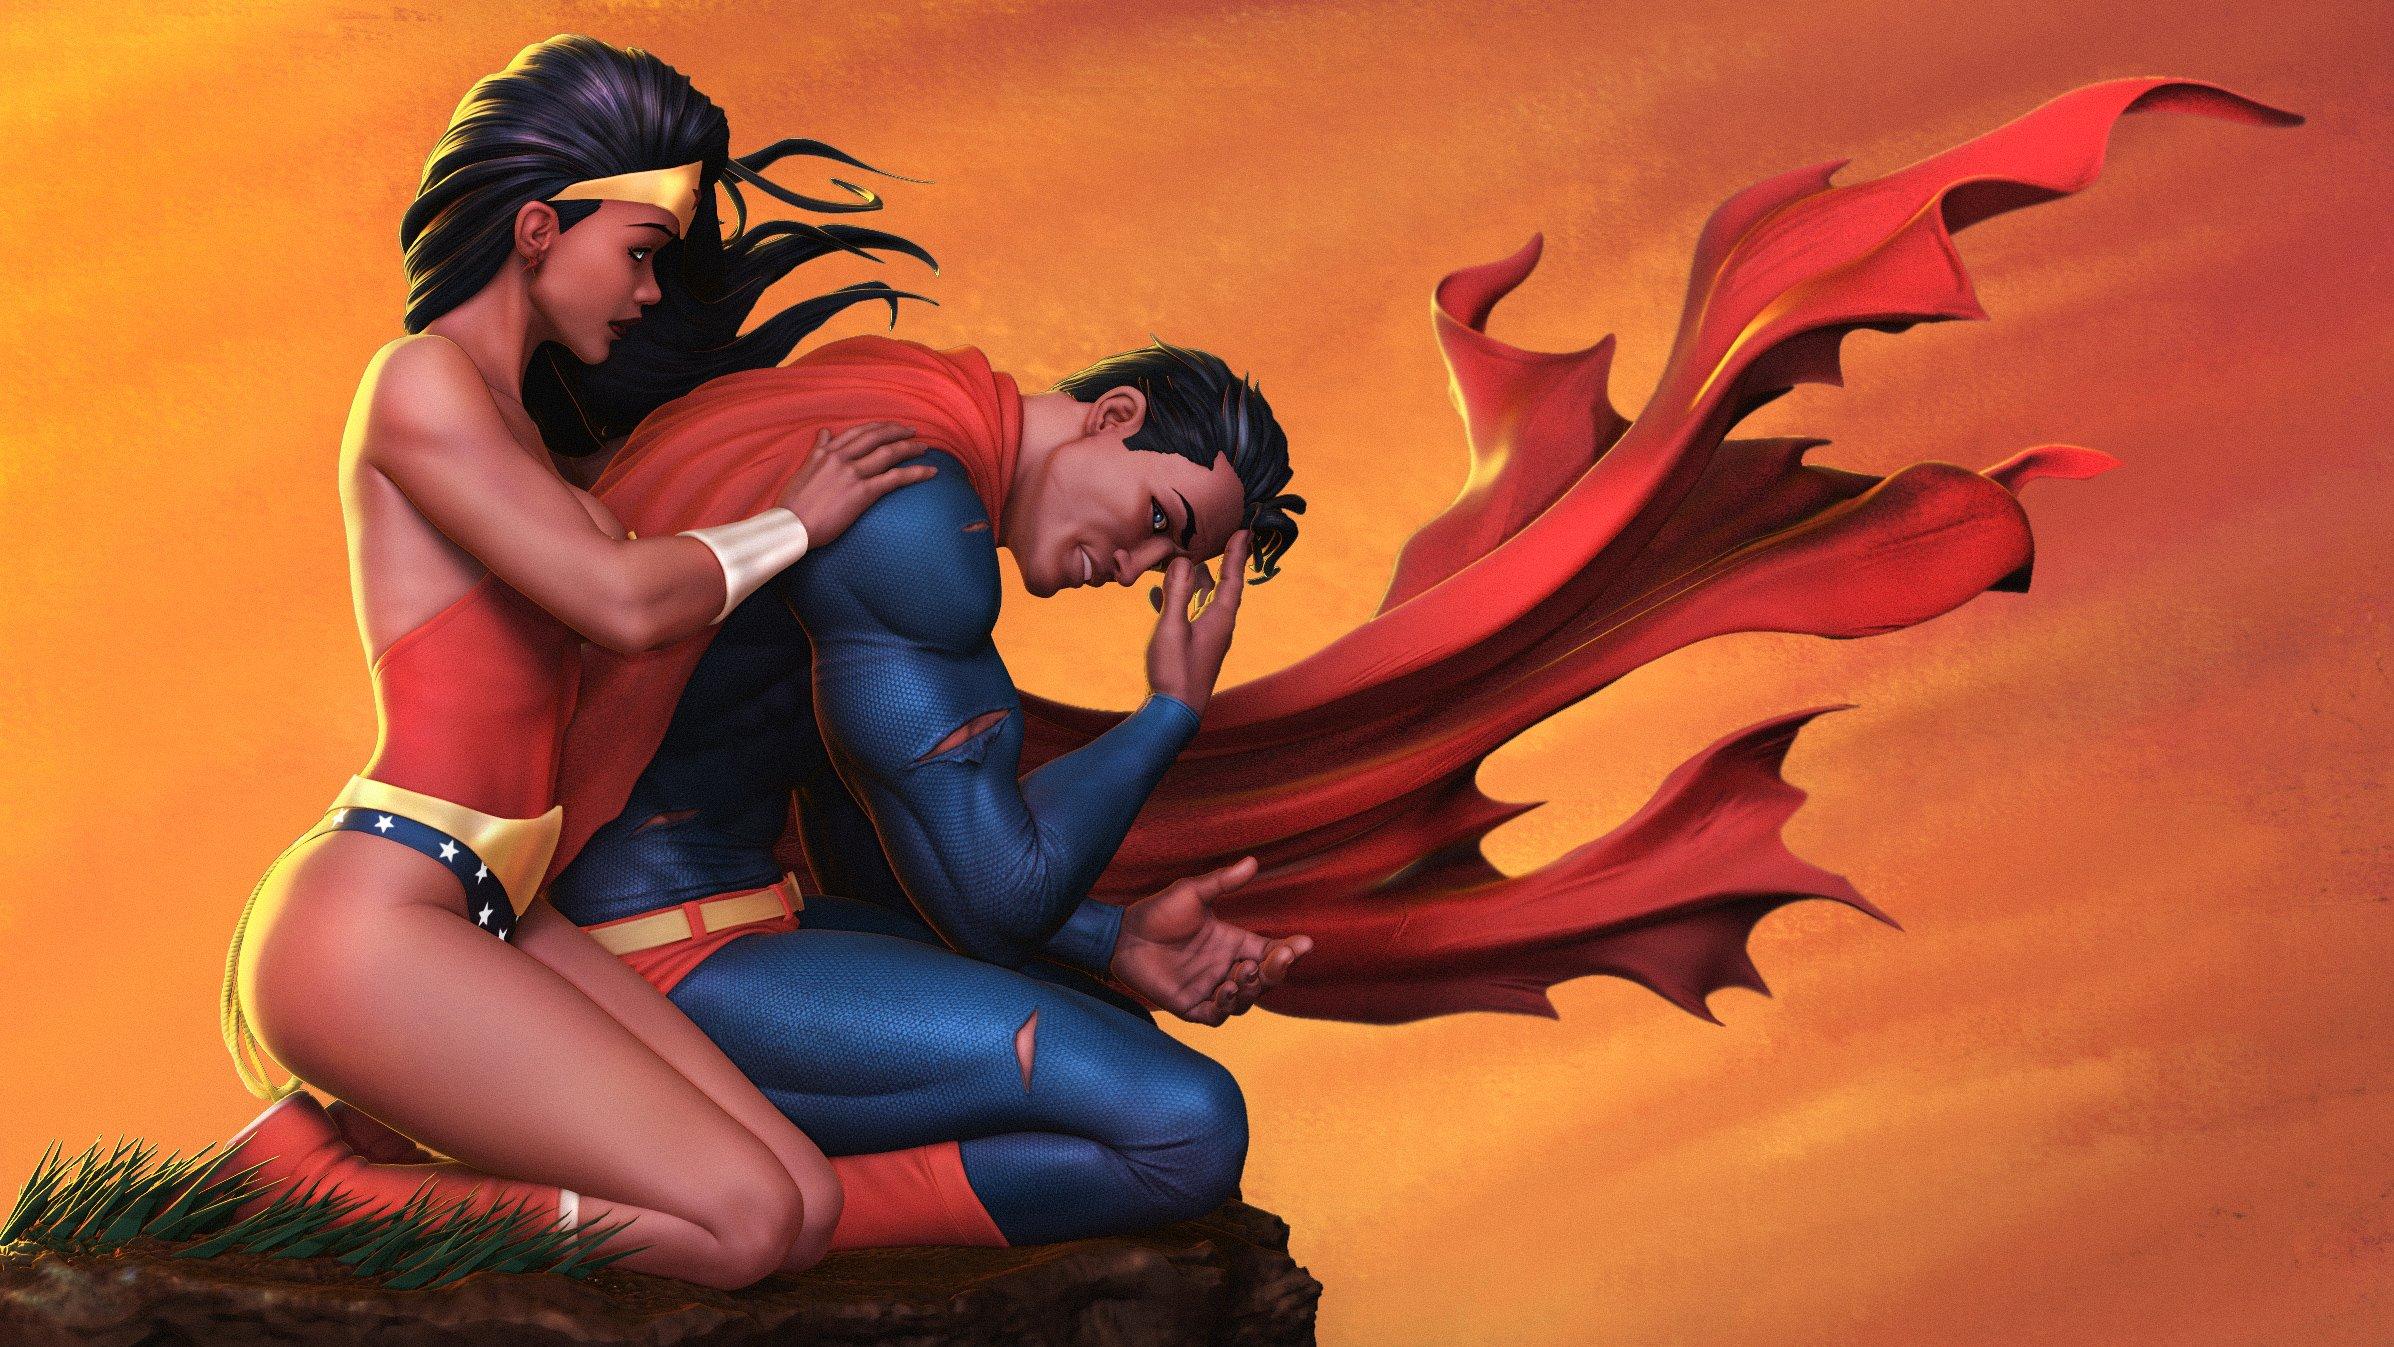 Fondos de pantalla La mujer maravilla abrazando a Superman